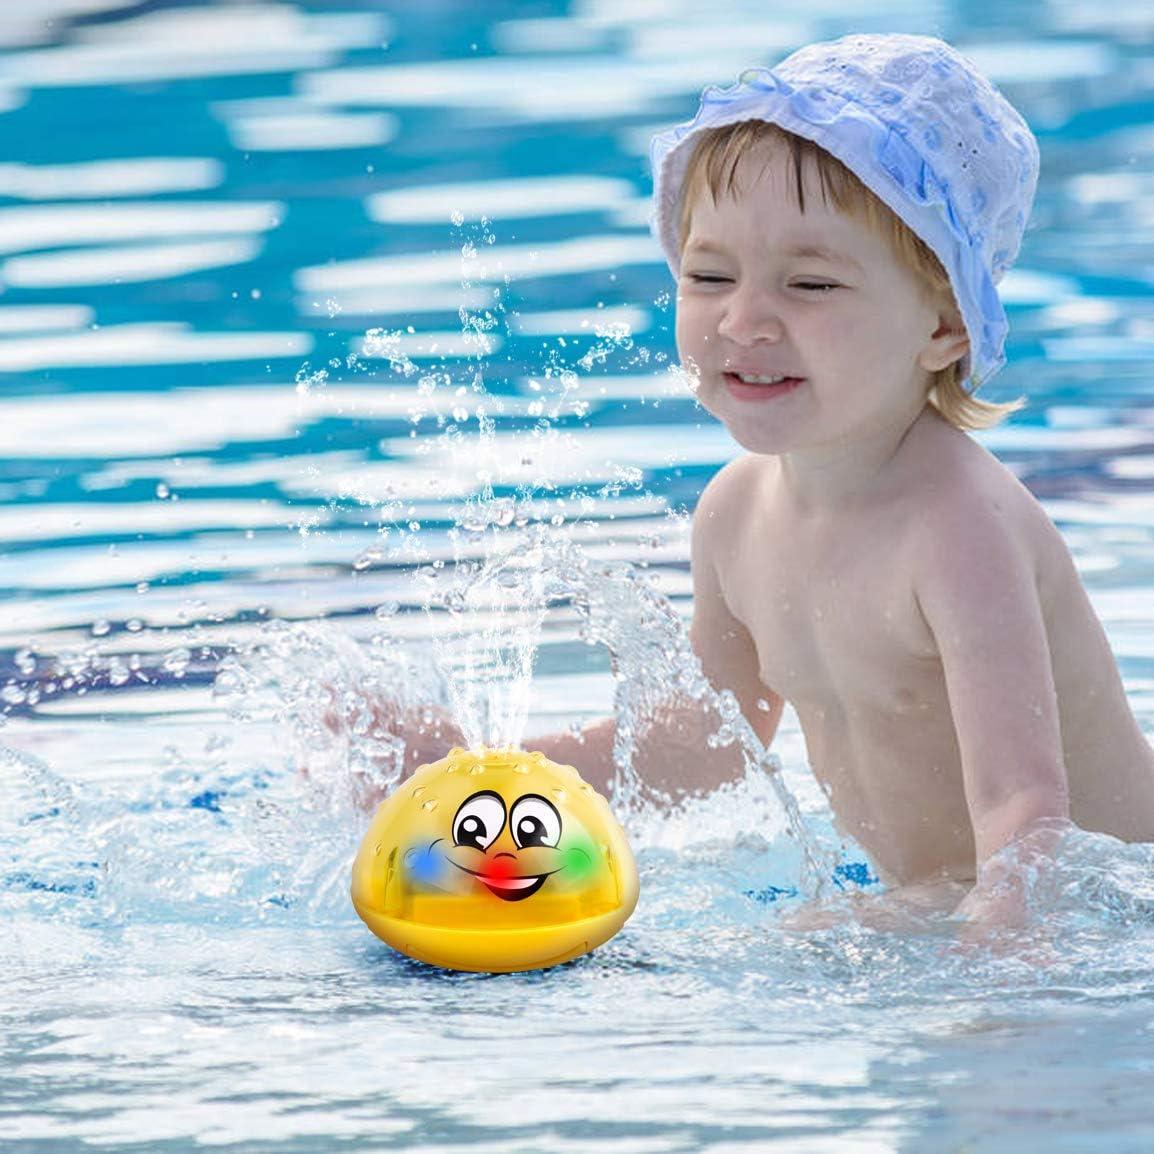 Refasy Children Bath Toys Automatic Water Spray Bathtub Toy for Kids Infant